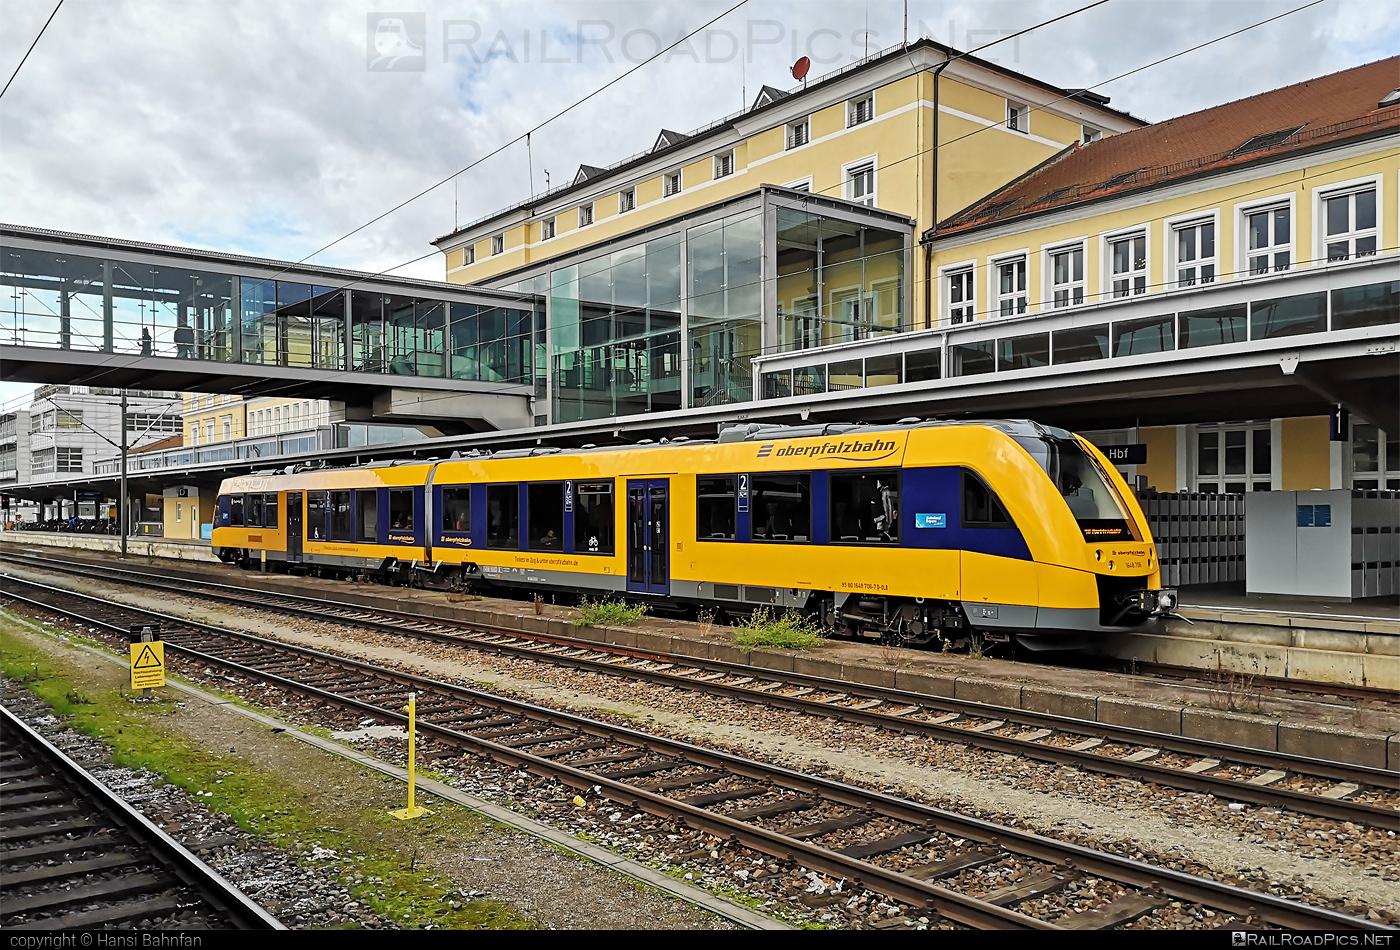 Alstom Coradia LINT 41 - 648 706-7 operated by Die Länderbahn GmbH DLB #alstom #alstomcoradia #alstomcoradialint #alstomcoradialint41 #coradialint41 #dielanderbahn #dlb #oberpfalzbahn